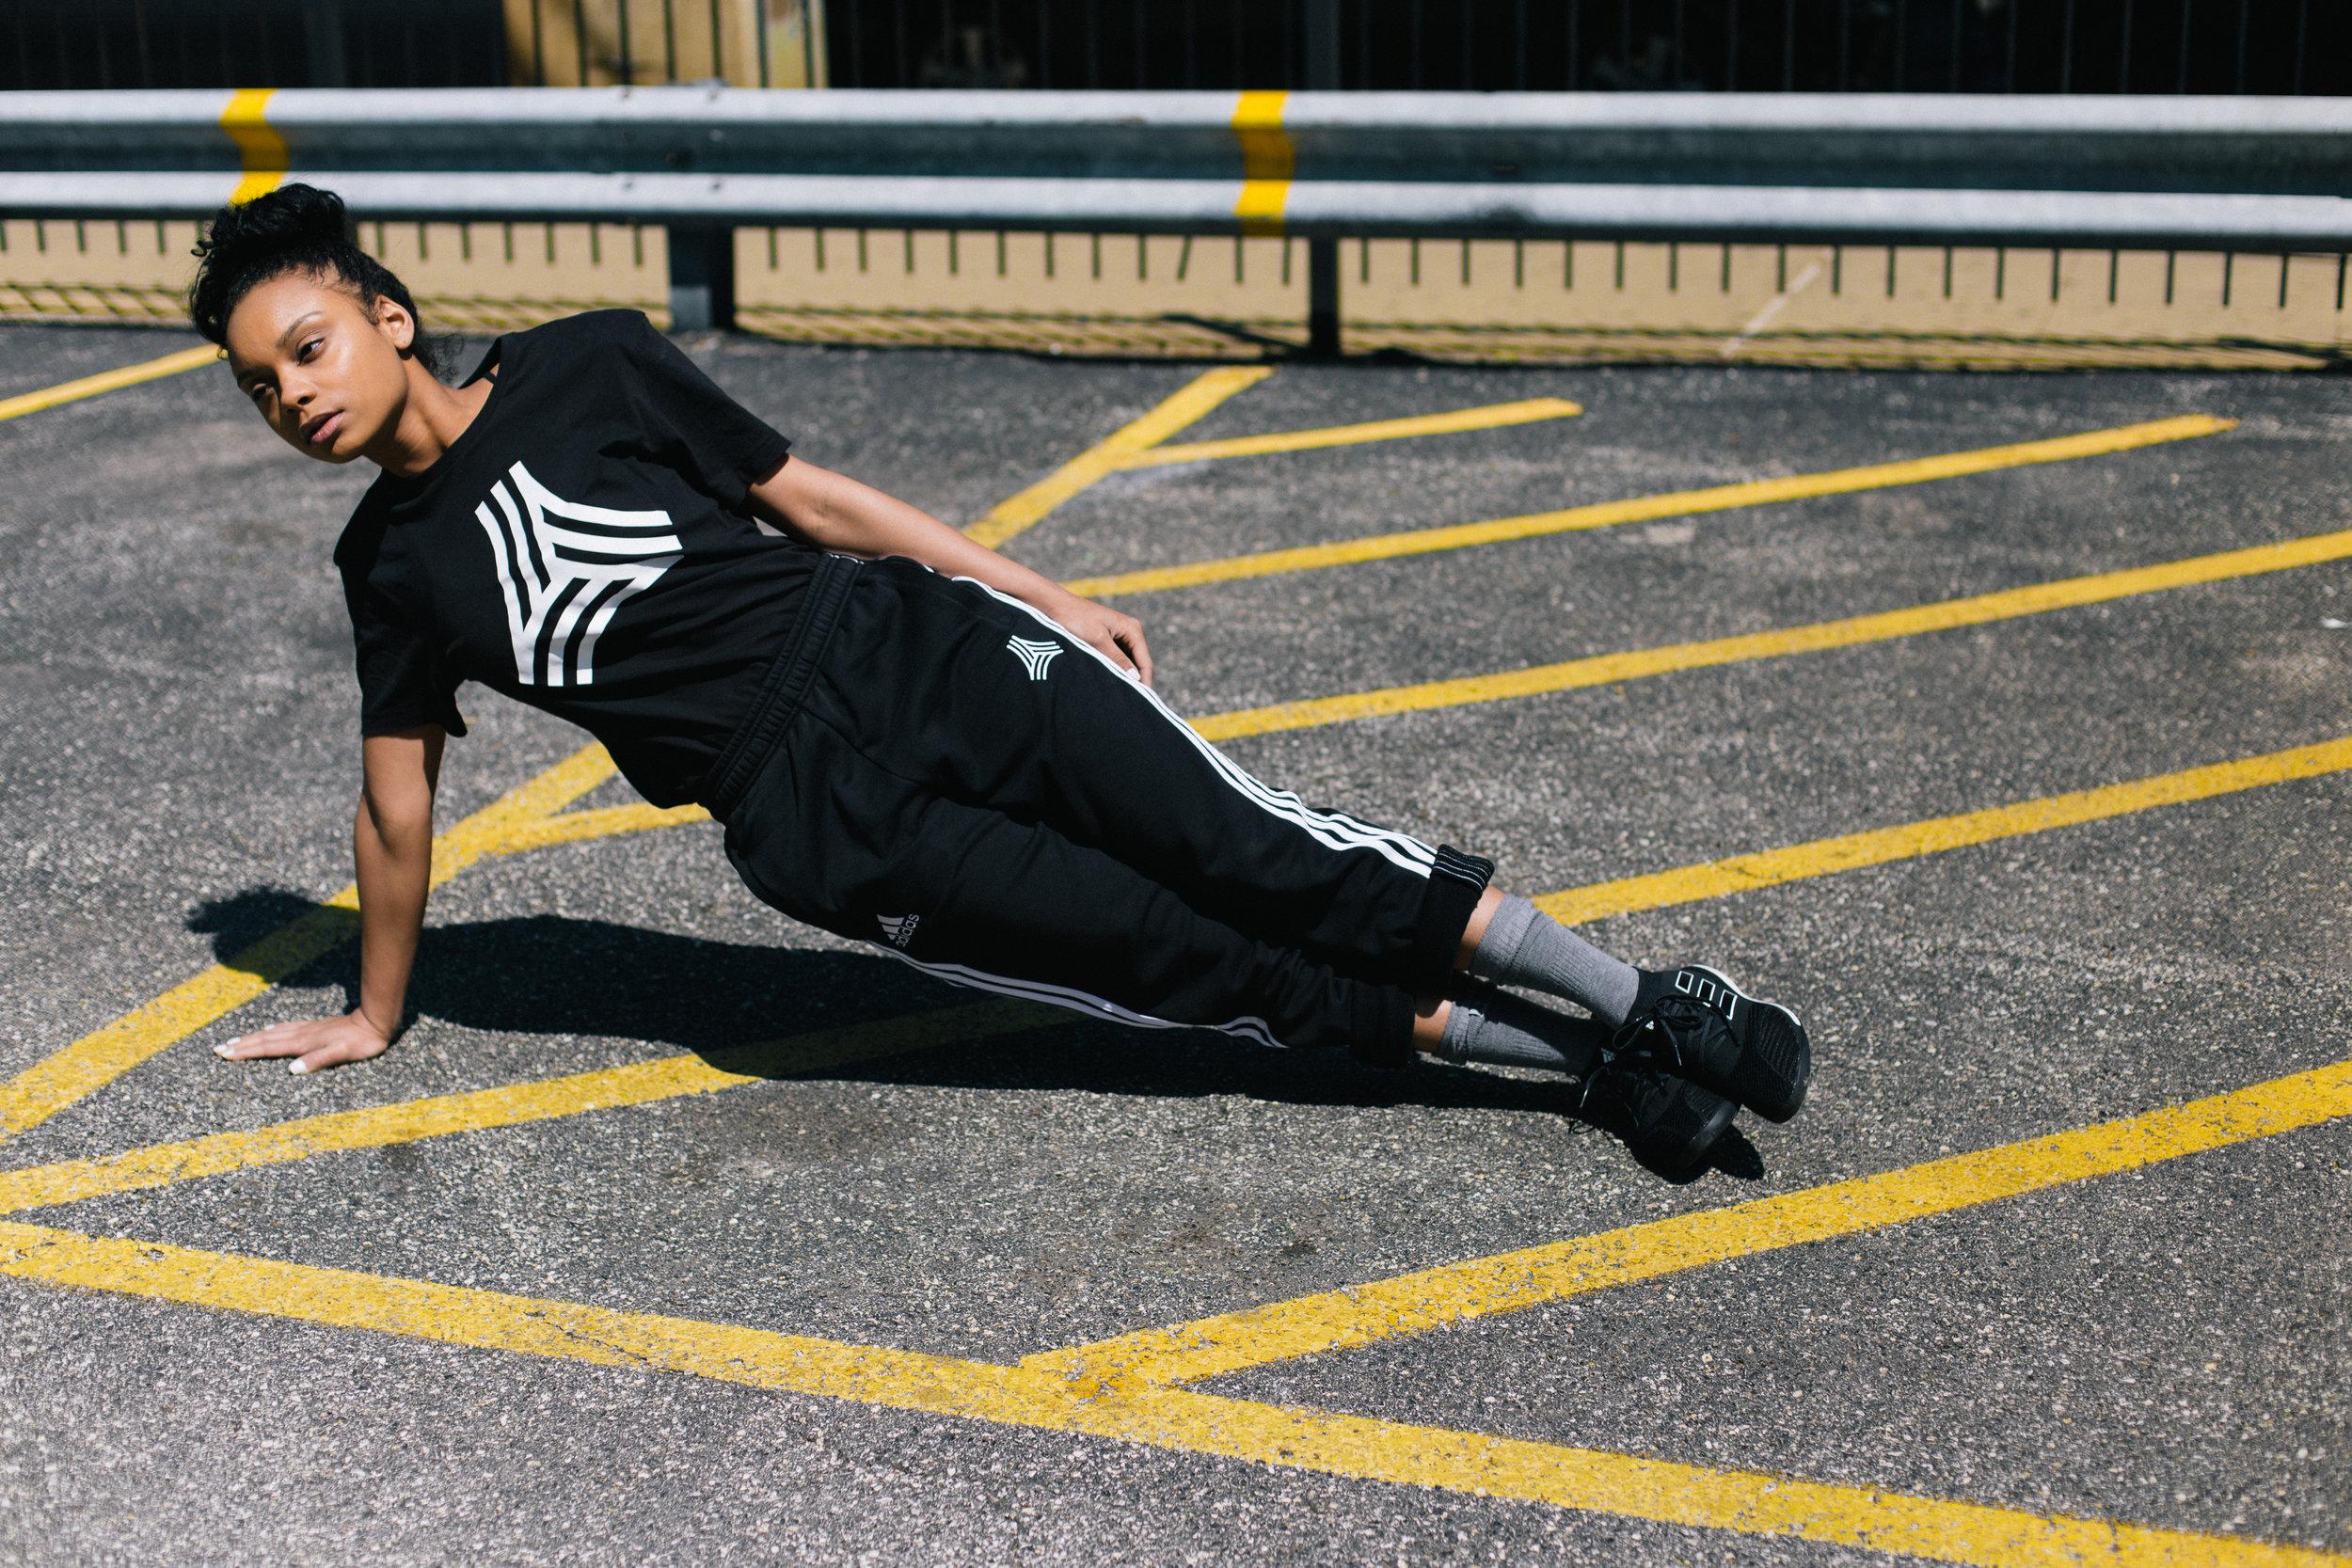 Adidas_Dollyave_003